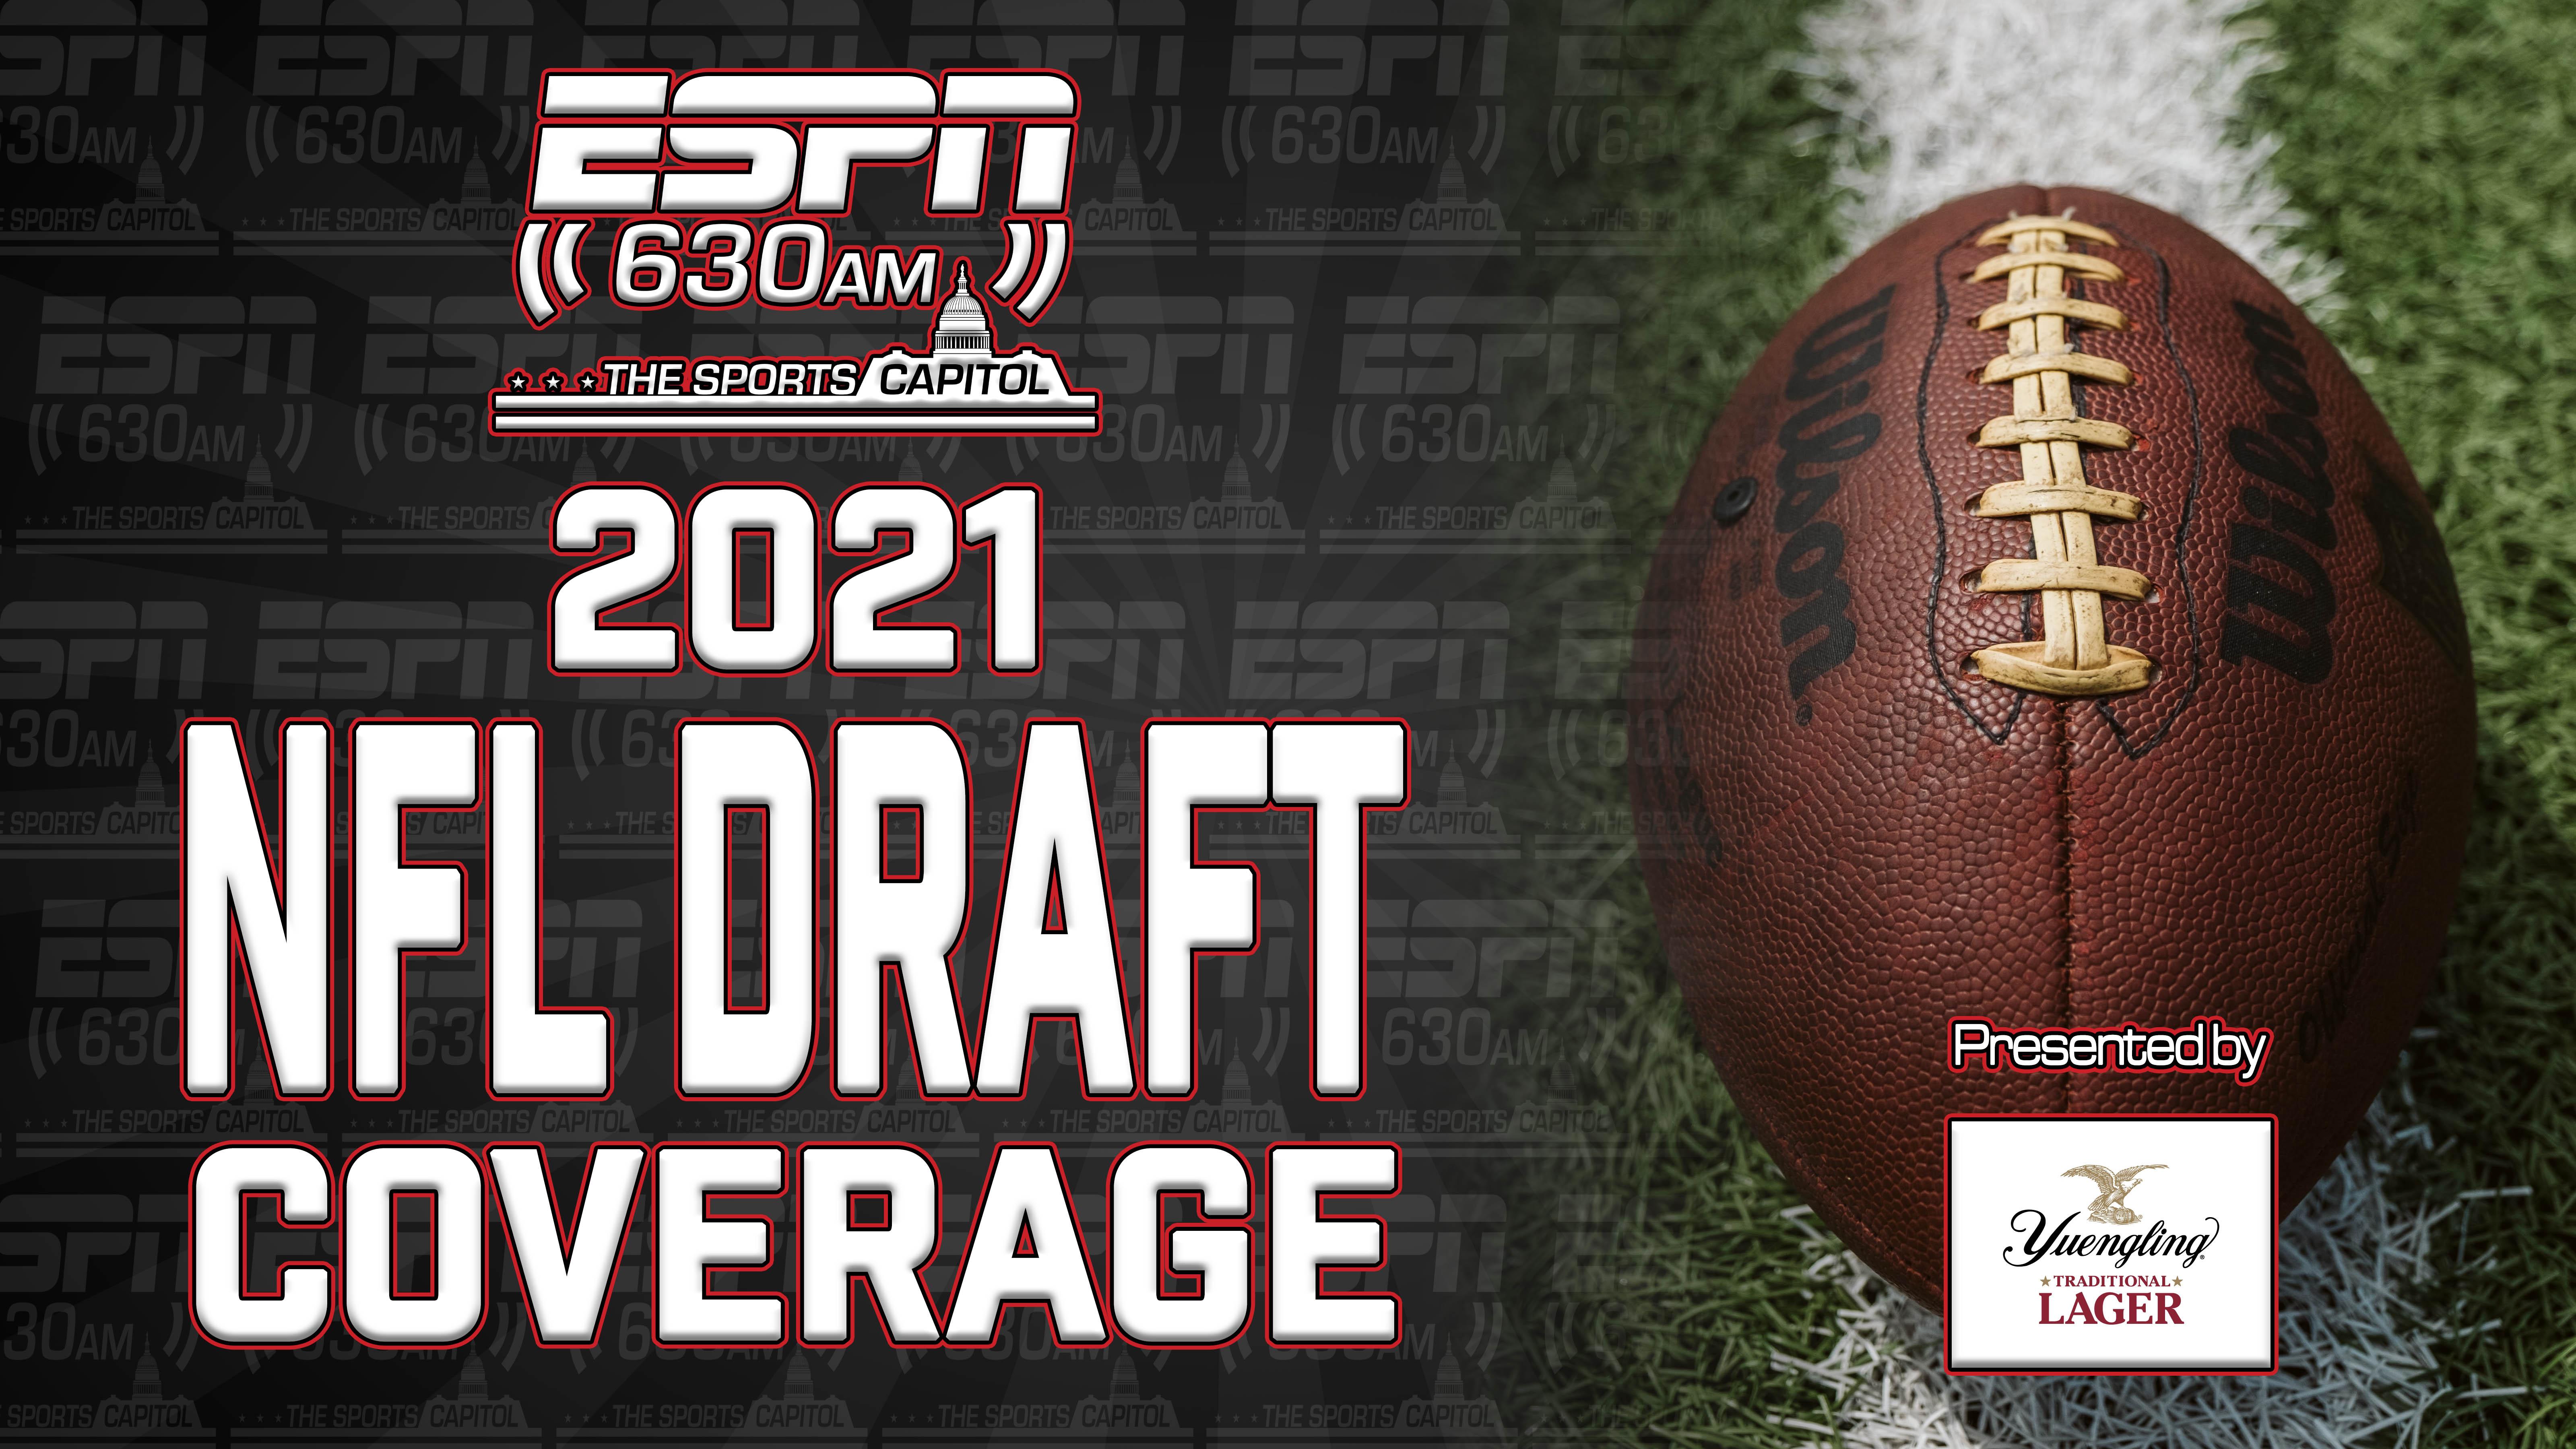 2021 NFL Draft Coverage